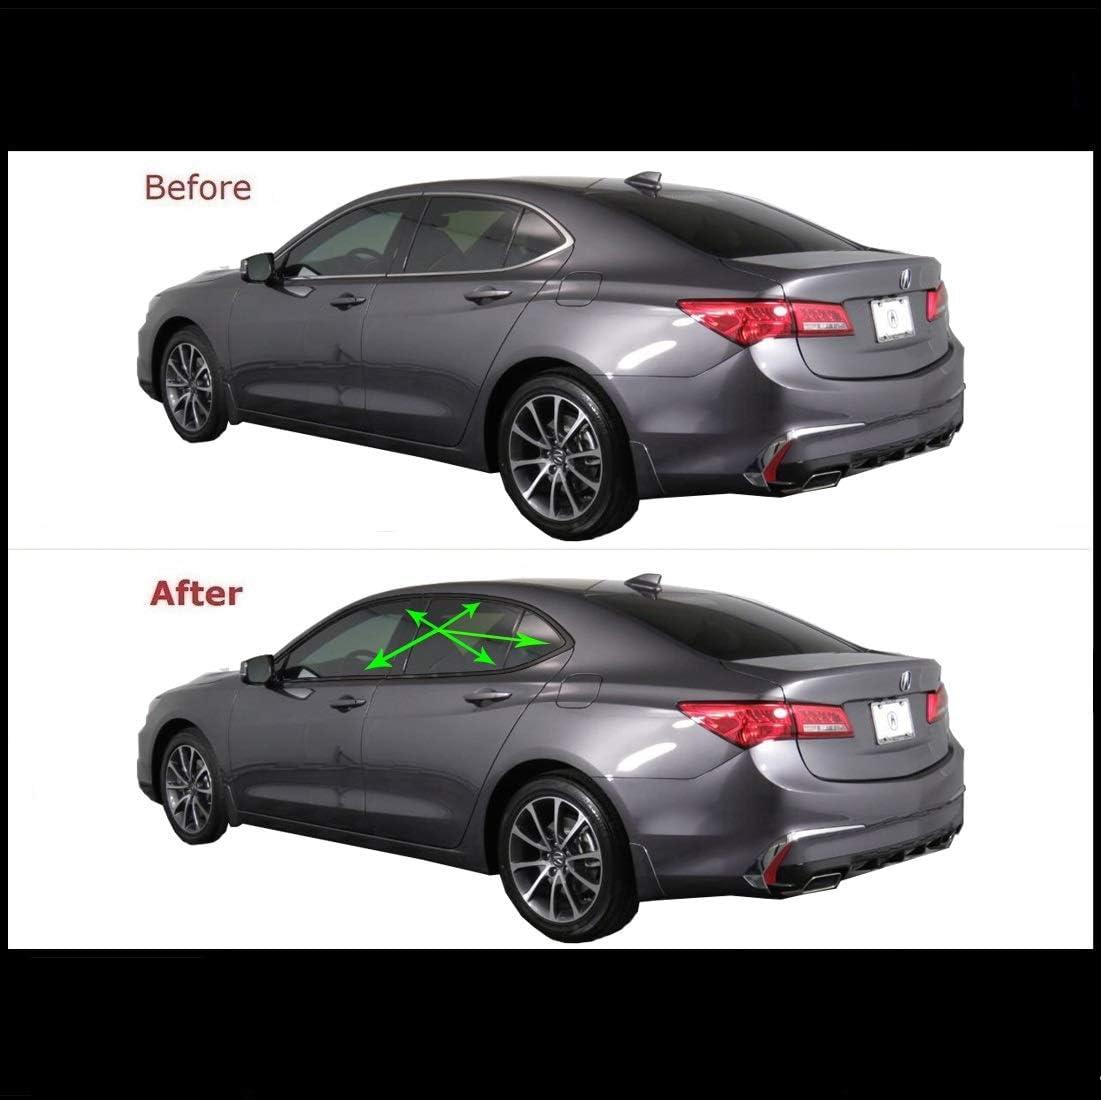 Chrome Delete Vinyl Kit Blackout Trim Overlay for 2015-20 Acura TLX Window Trim Matte Black